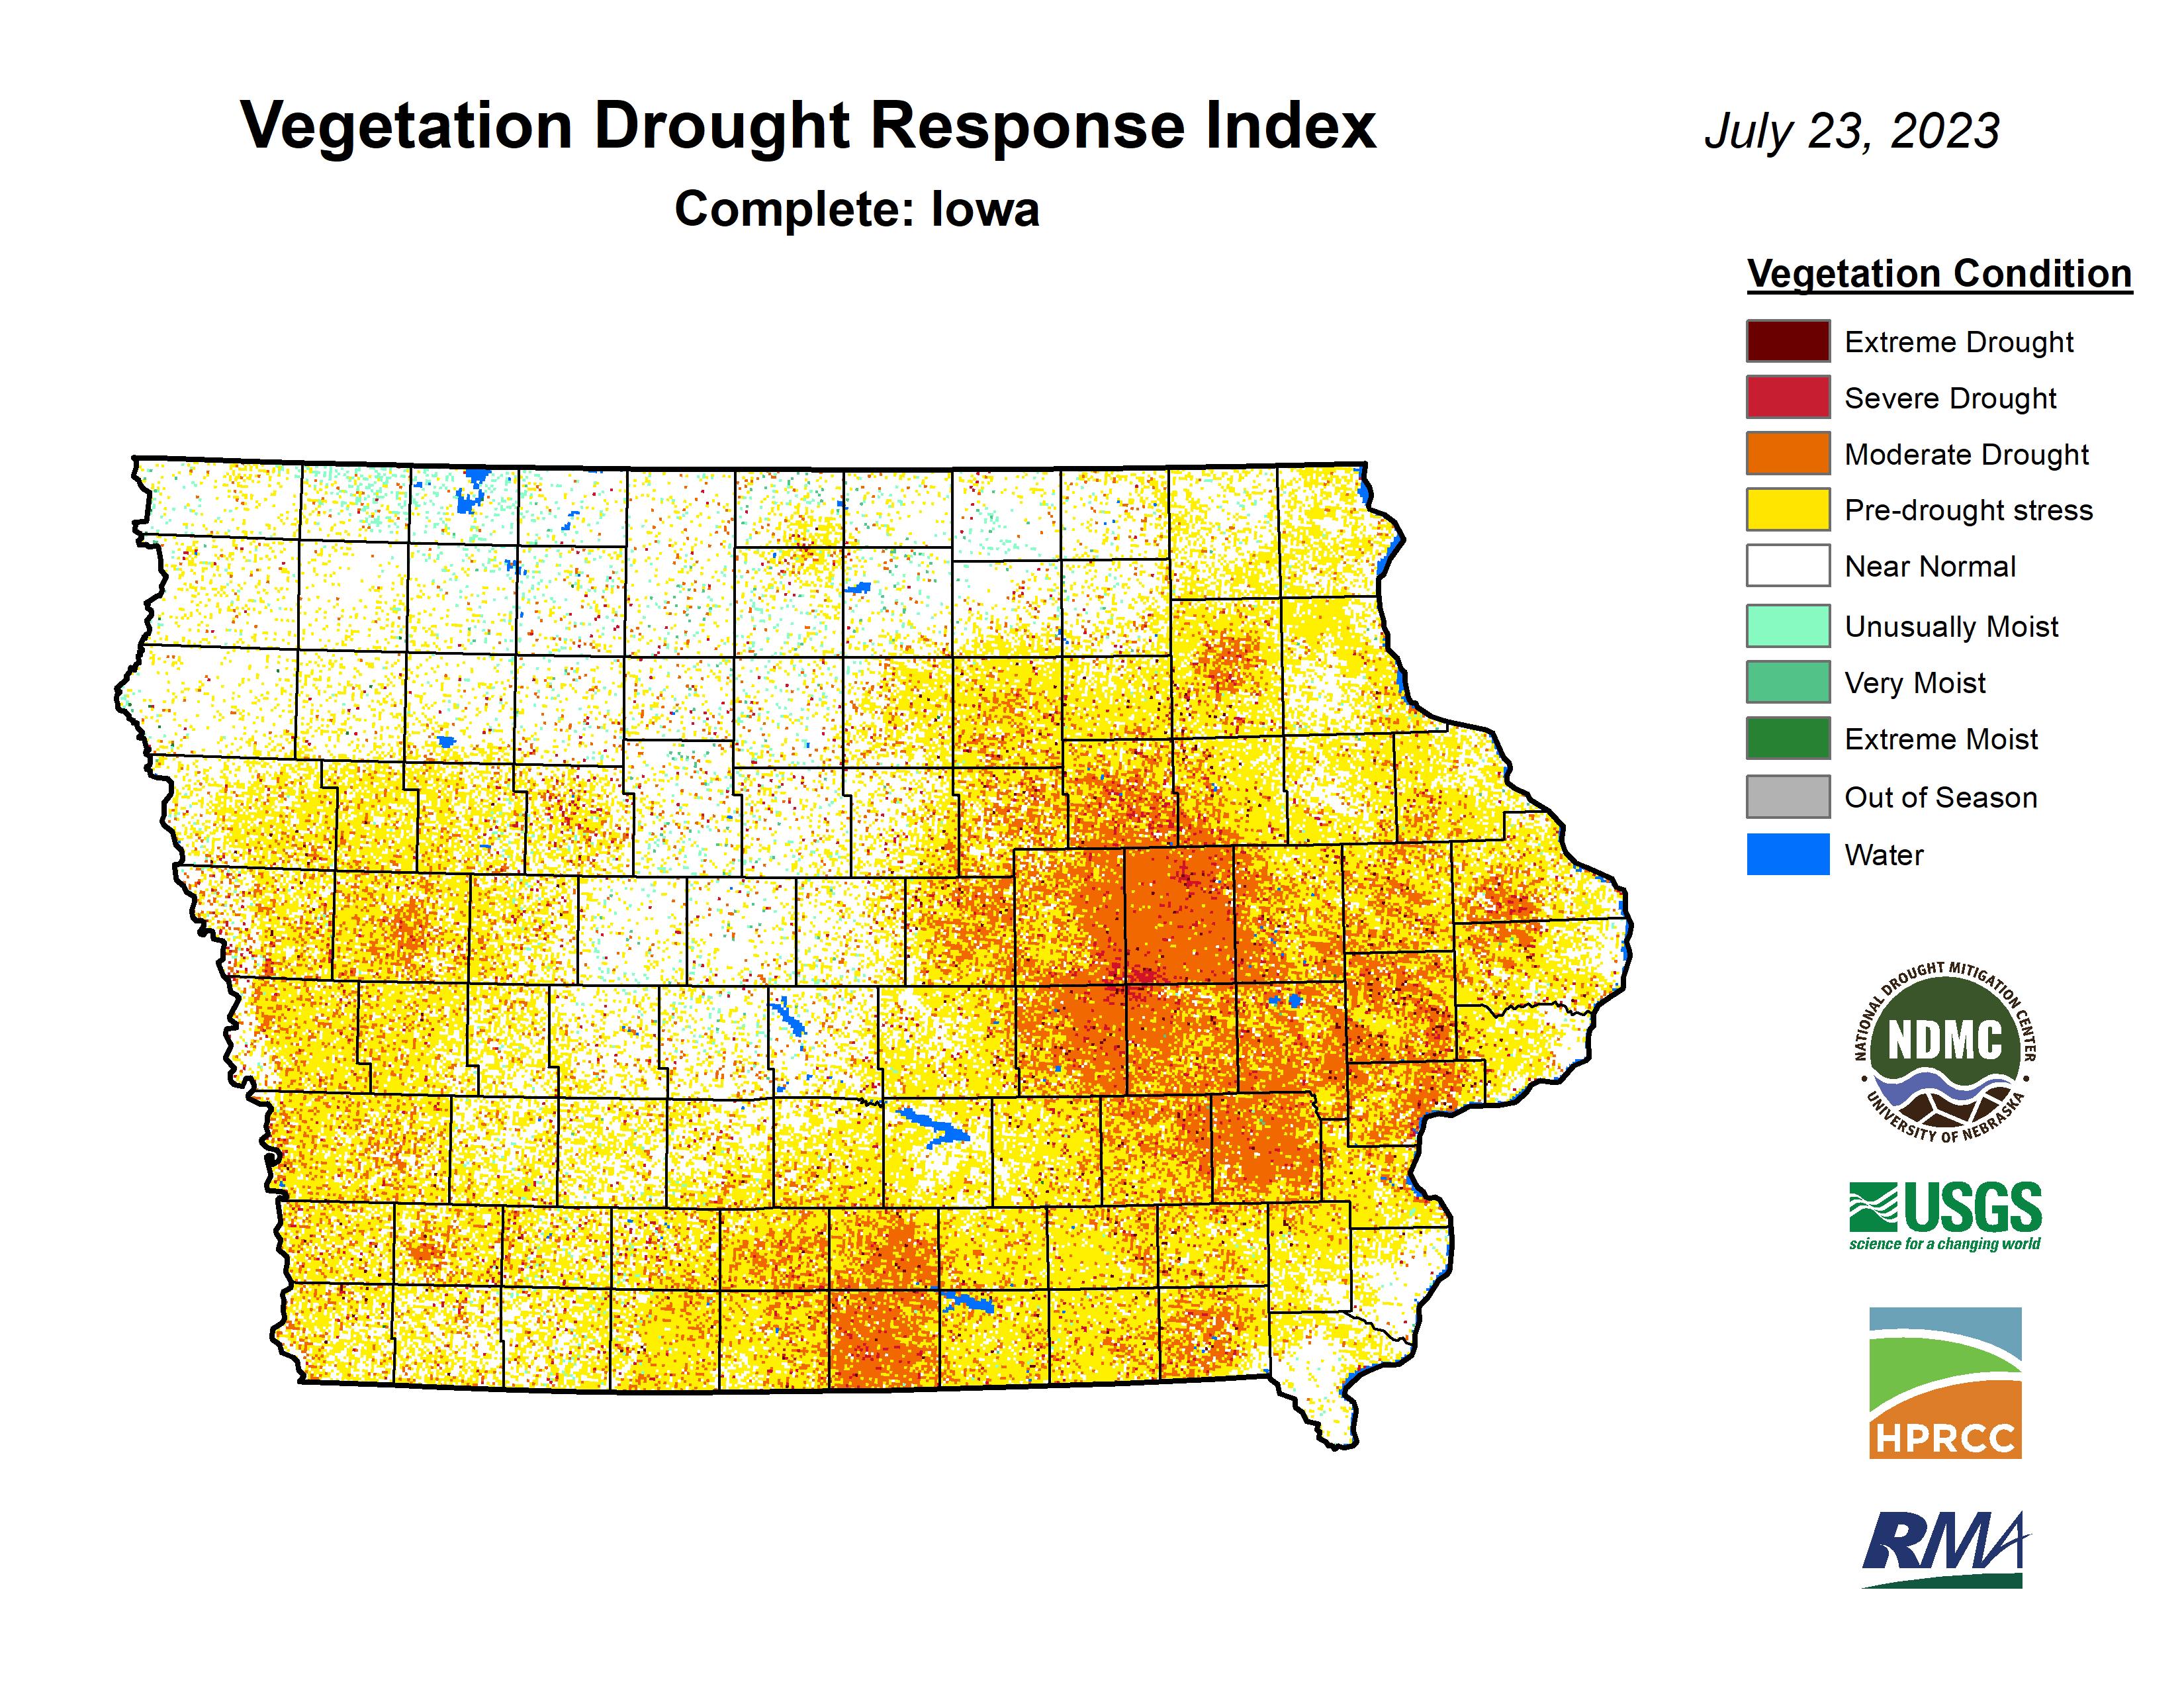 Vegetation Drought Response Index (VegDRI), complete, Iowa